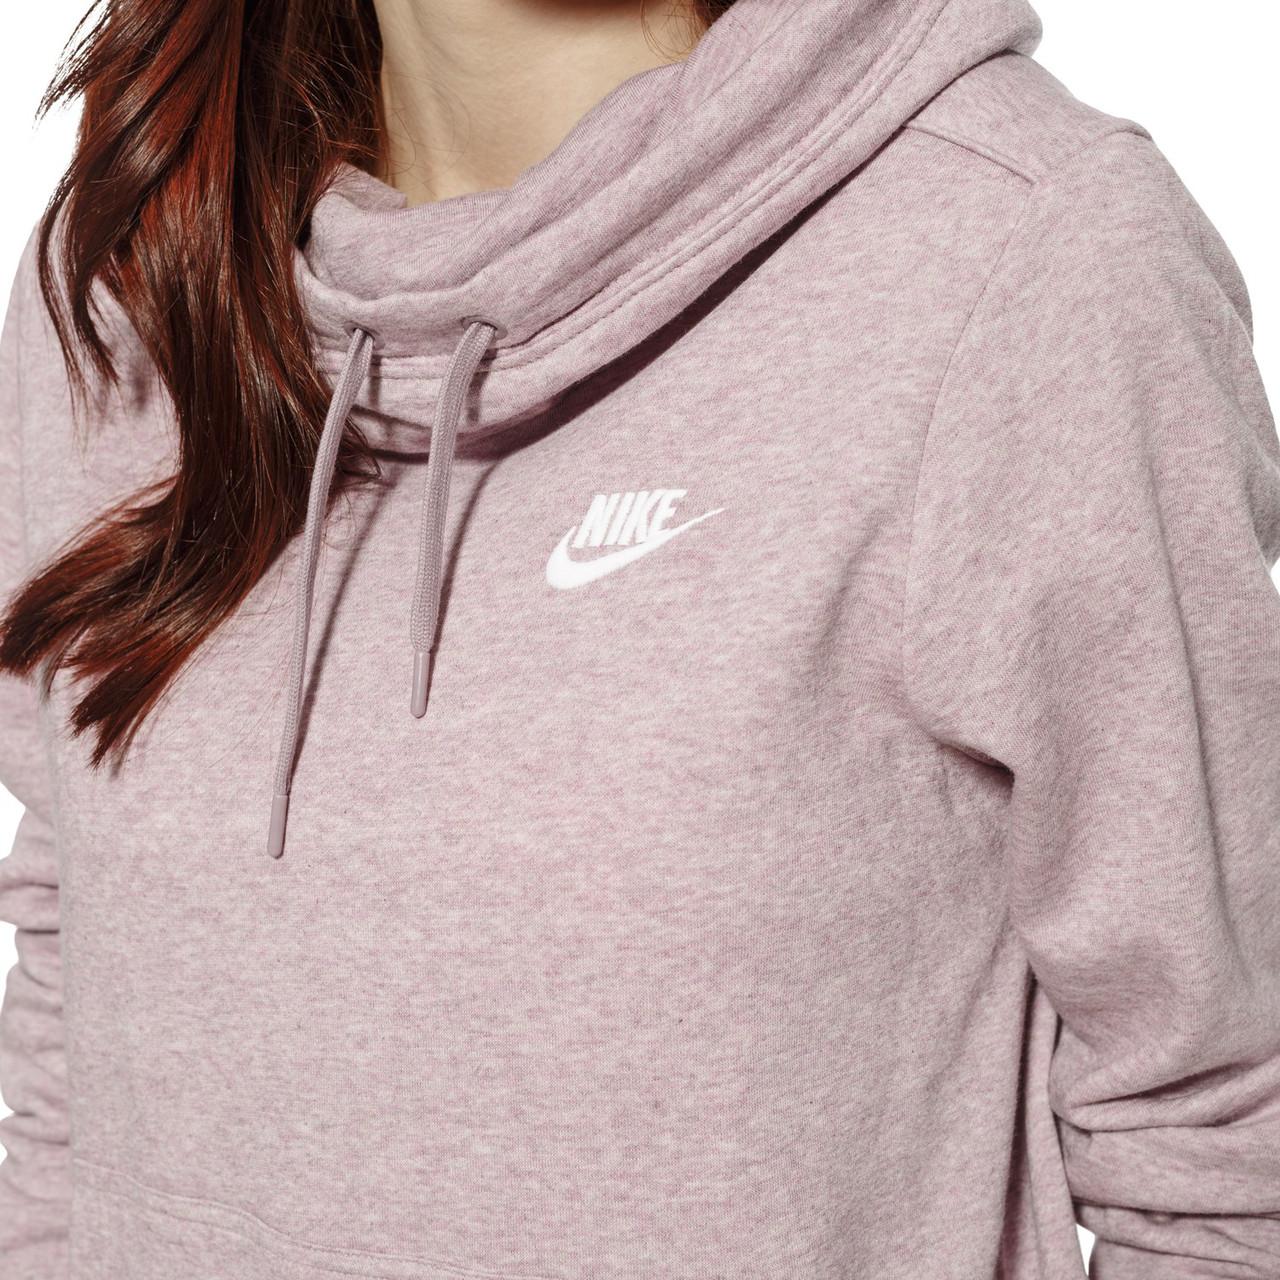 d72e90b5 Женская Толстовка Nike Nsw Fnl Flc 853928-694 (Оригинал), цена 1 034,10  грн., купить в Киеве — Prom.ua (ID#721054759)